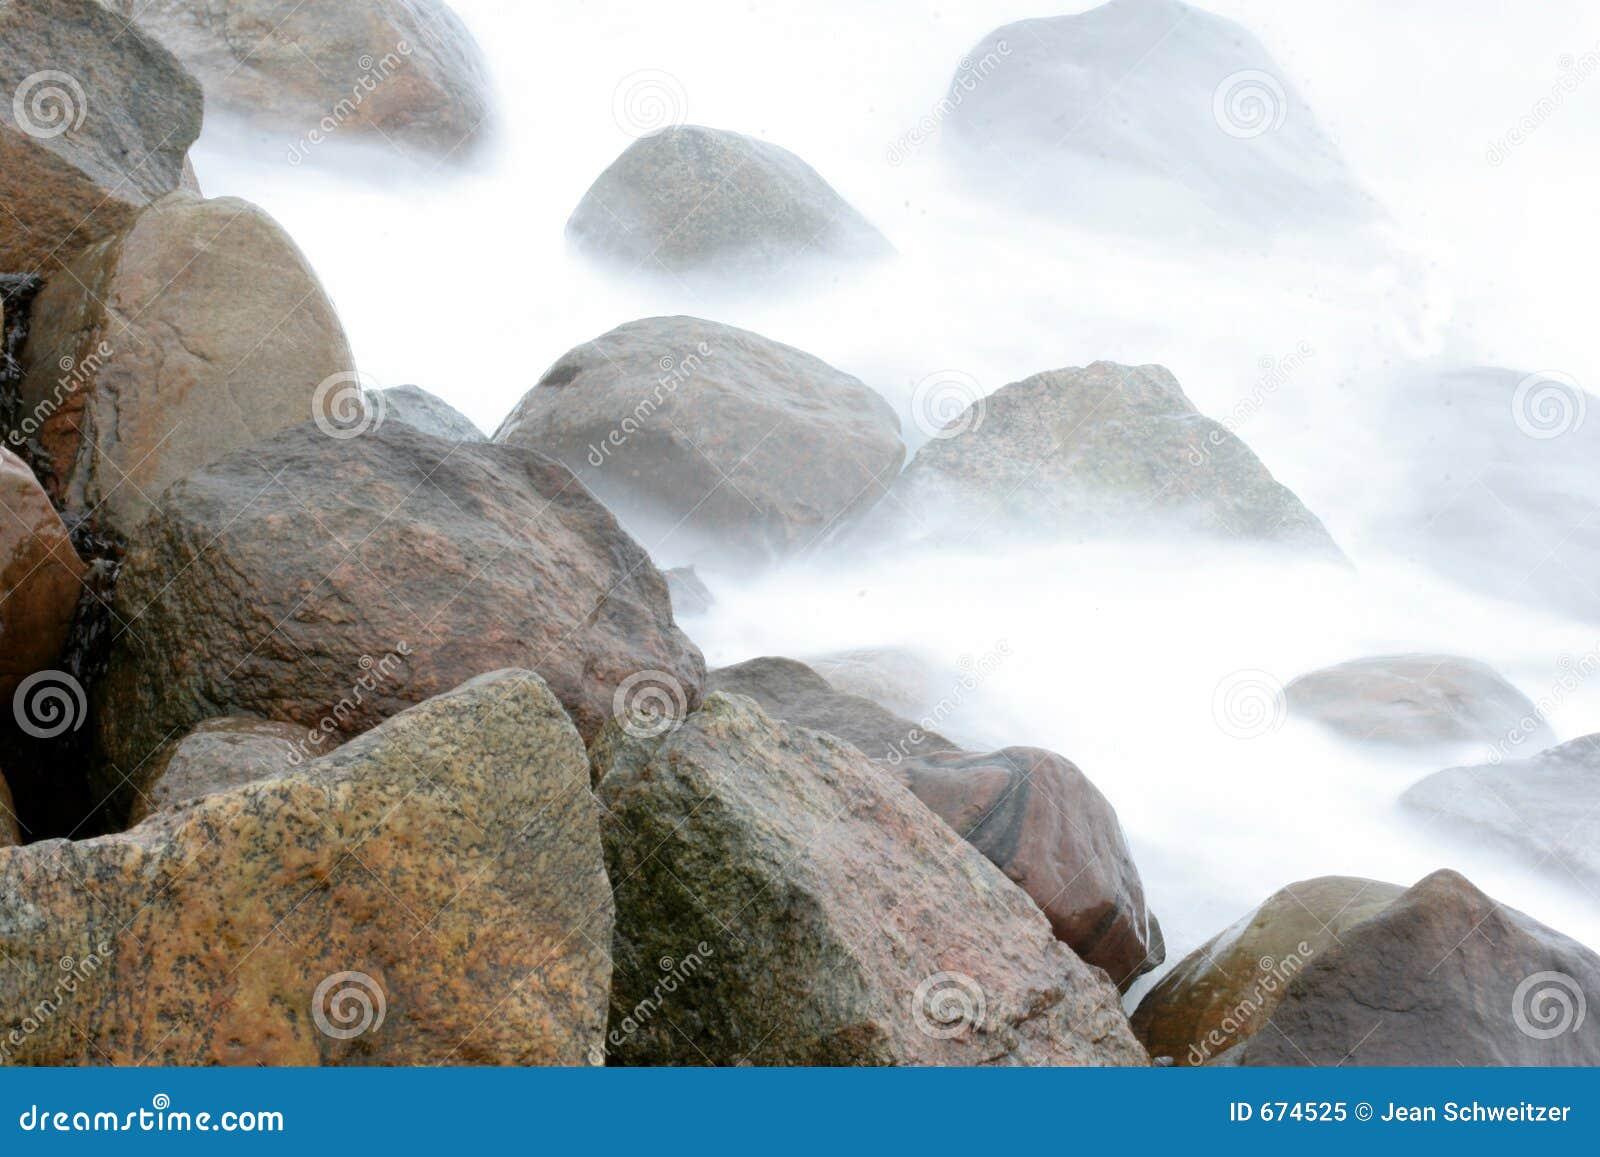 on stones ocean -#main